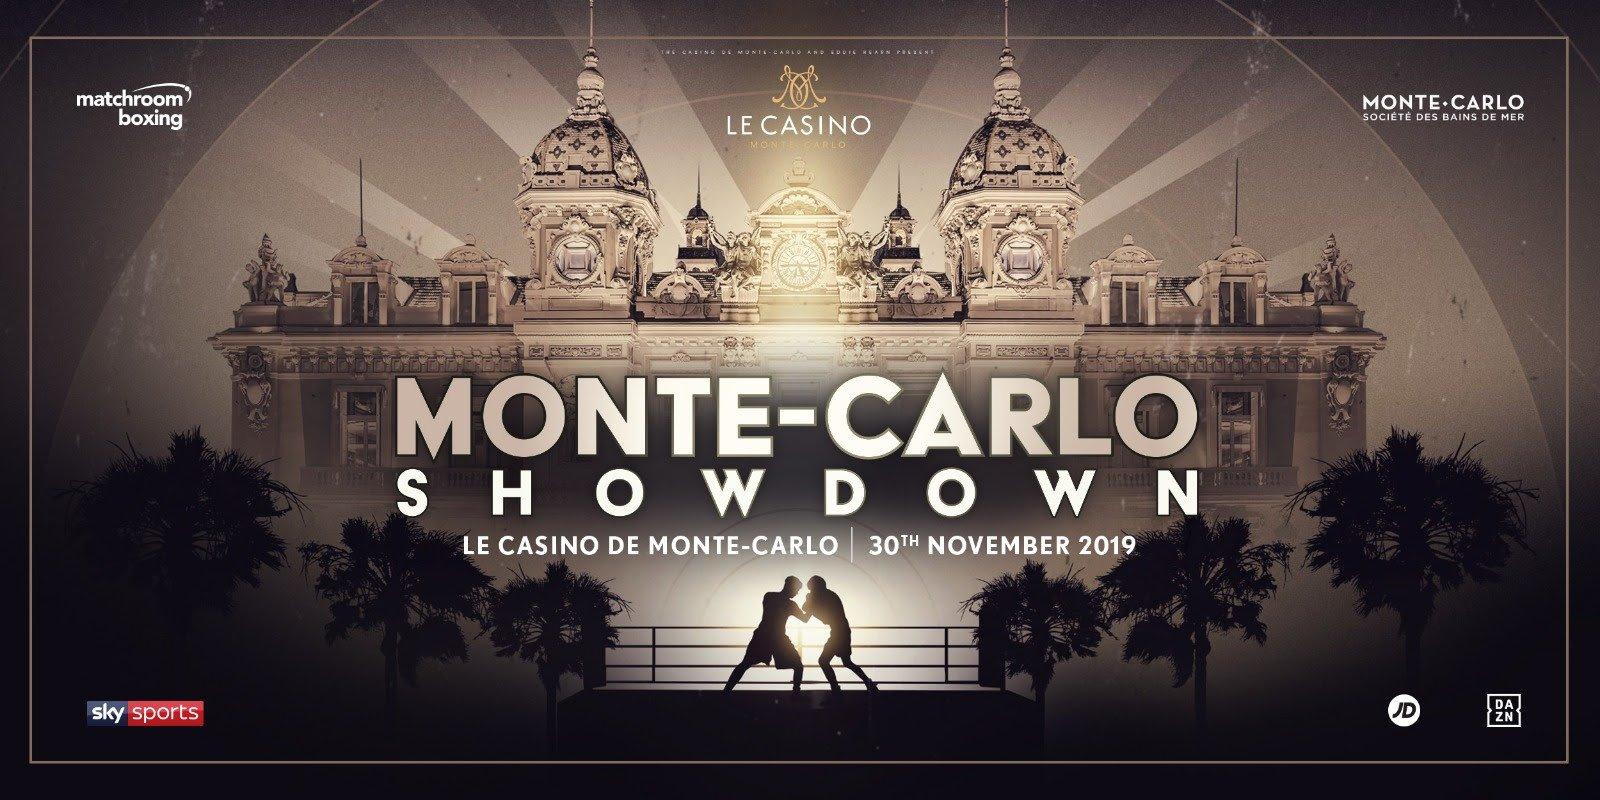 - Eddie Hearn and the Casino de Monte-Carlo are delighted to announce the Monte-Carlo Boxing Showdown, a night of World Championship Boxing, will take place in the heart of the prestigious Casino de Monte-Carlo on Saturday November 30, shown live on Sky Sports in the UK and DAZN in the US.